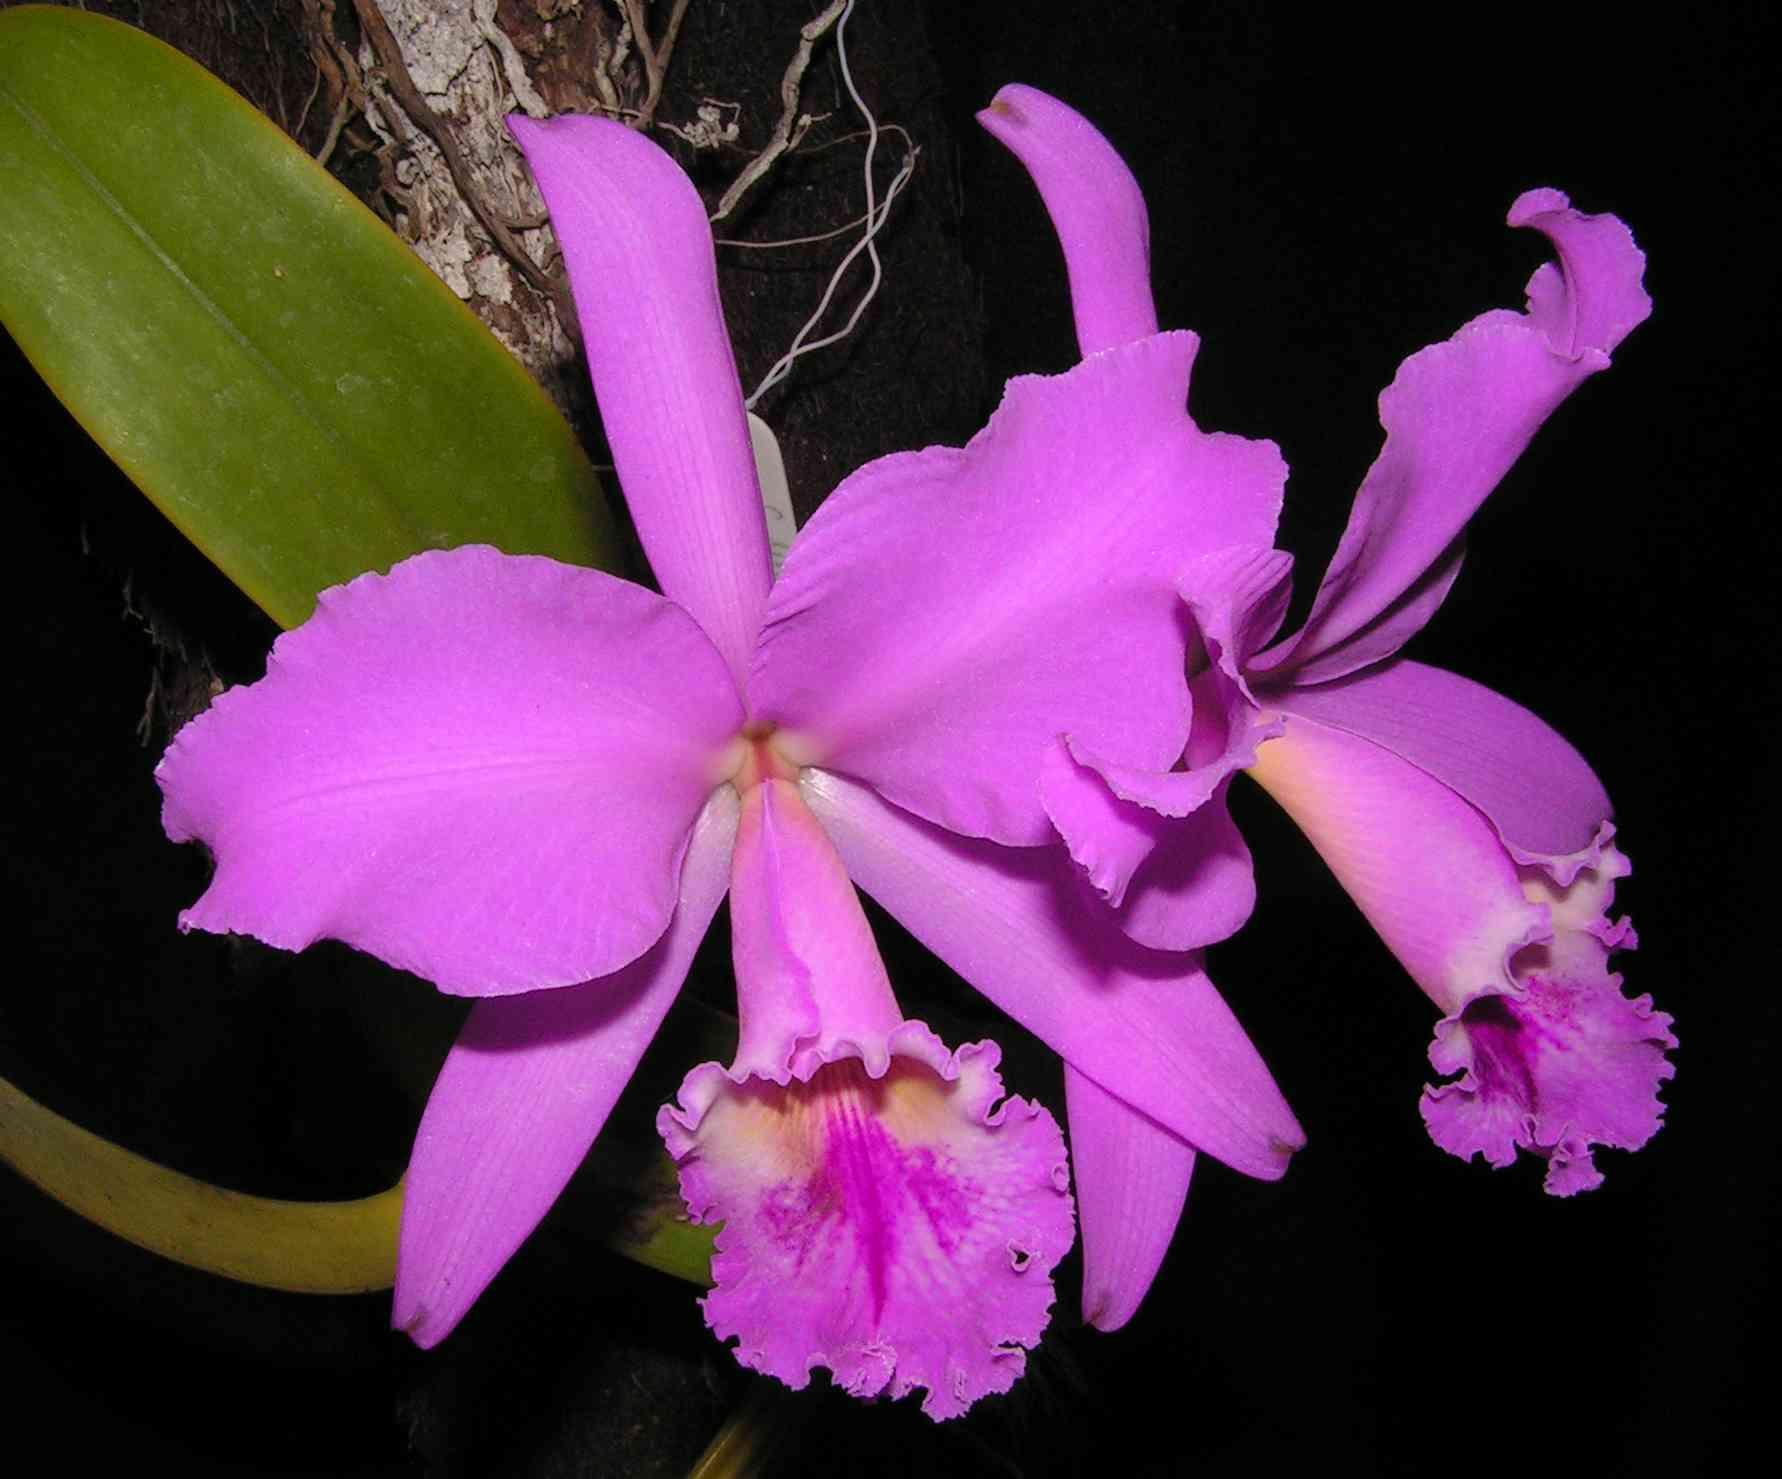 Como Cuidar de Orquídeas - Espécies e Segredos - Dicas e Cuidados